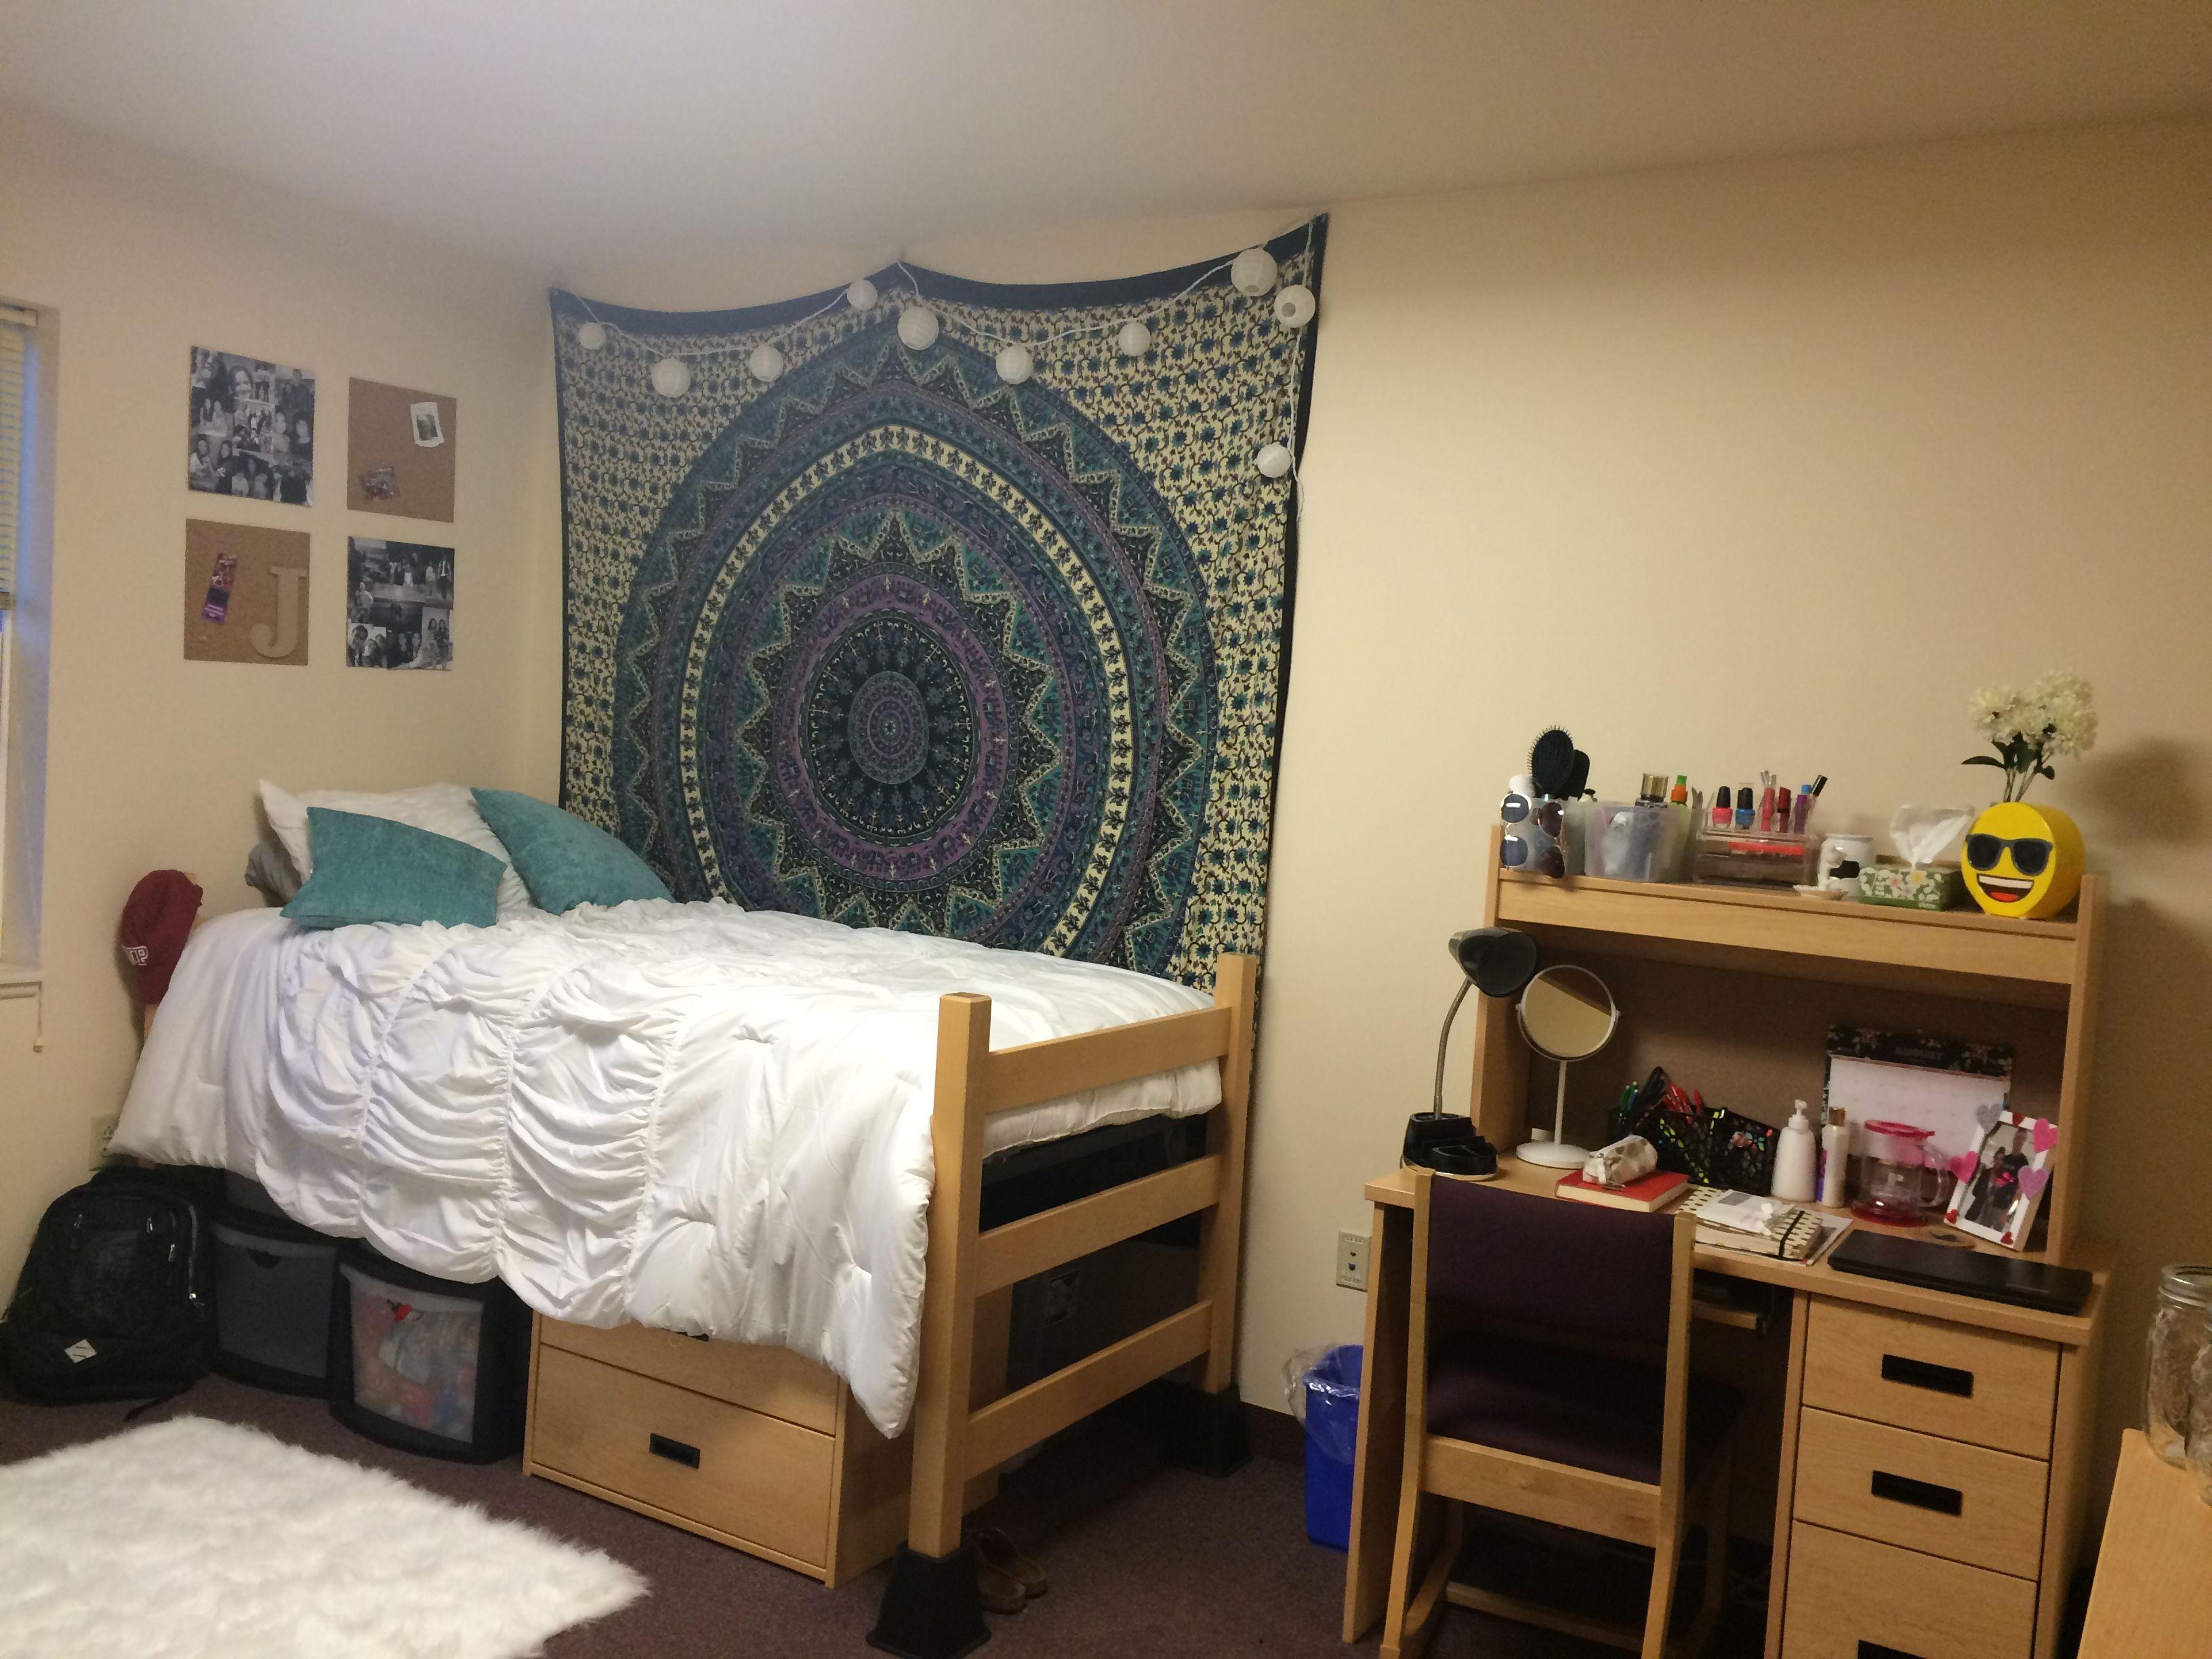 iup dorm college breakfest dorm home decor home rh pinterest com